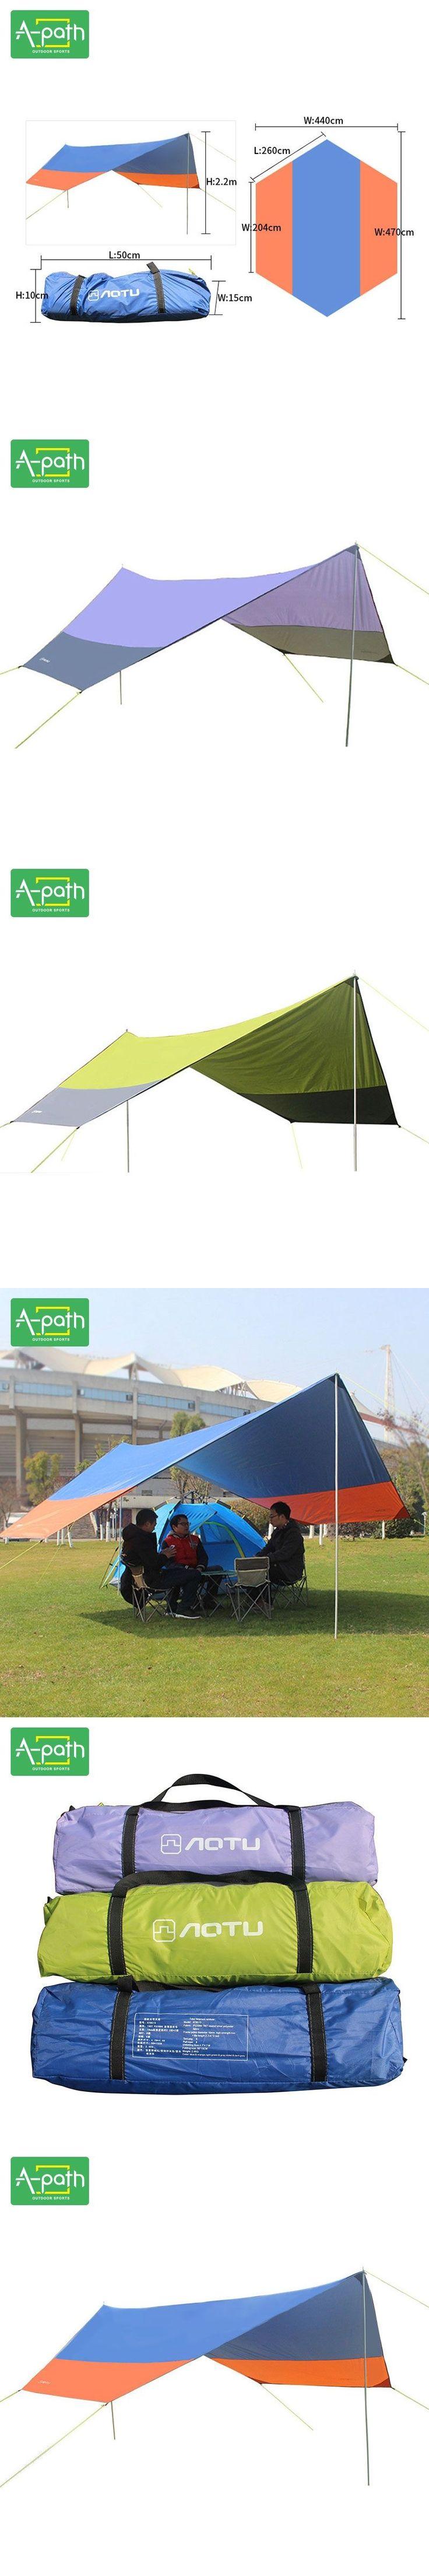 8 Person Large Outdoor Camping Sun Shelter Tarp Awning Beach Fishing Umbrella Party Garden Folding Car Tent Arbor Snowglobe #FishingUmbrella